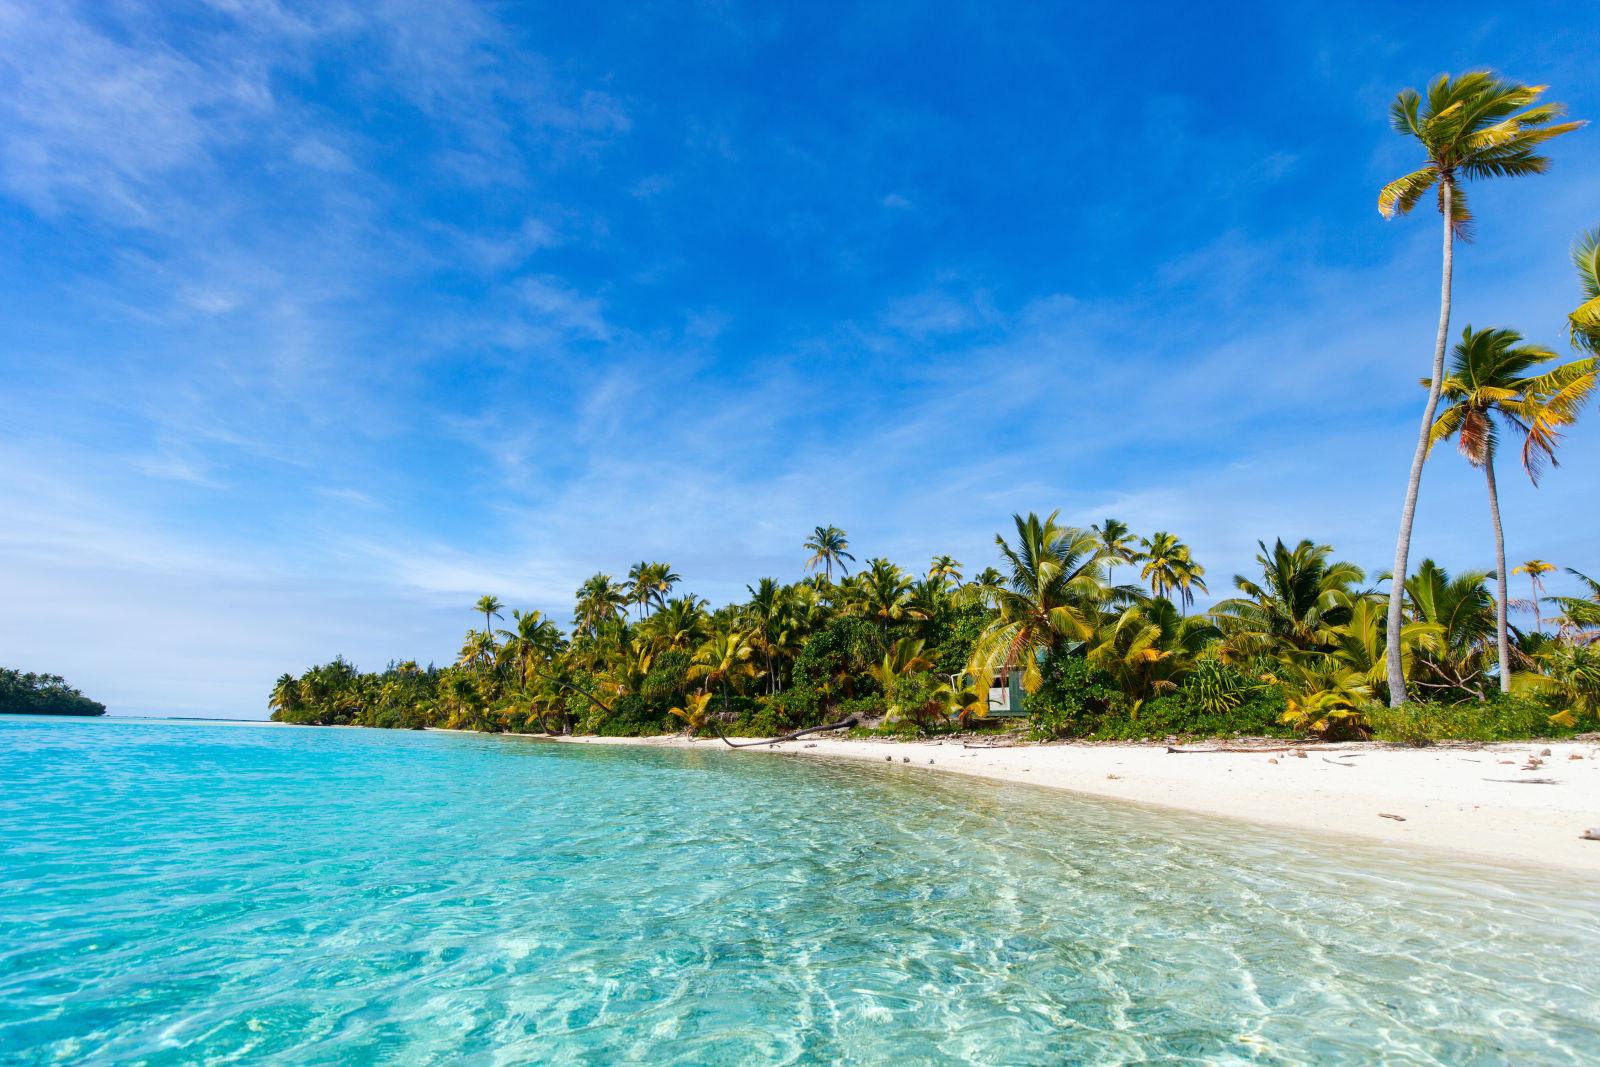 Aitutaki One Foot island Cook Island Südsee Strand Palmen Meer